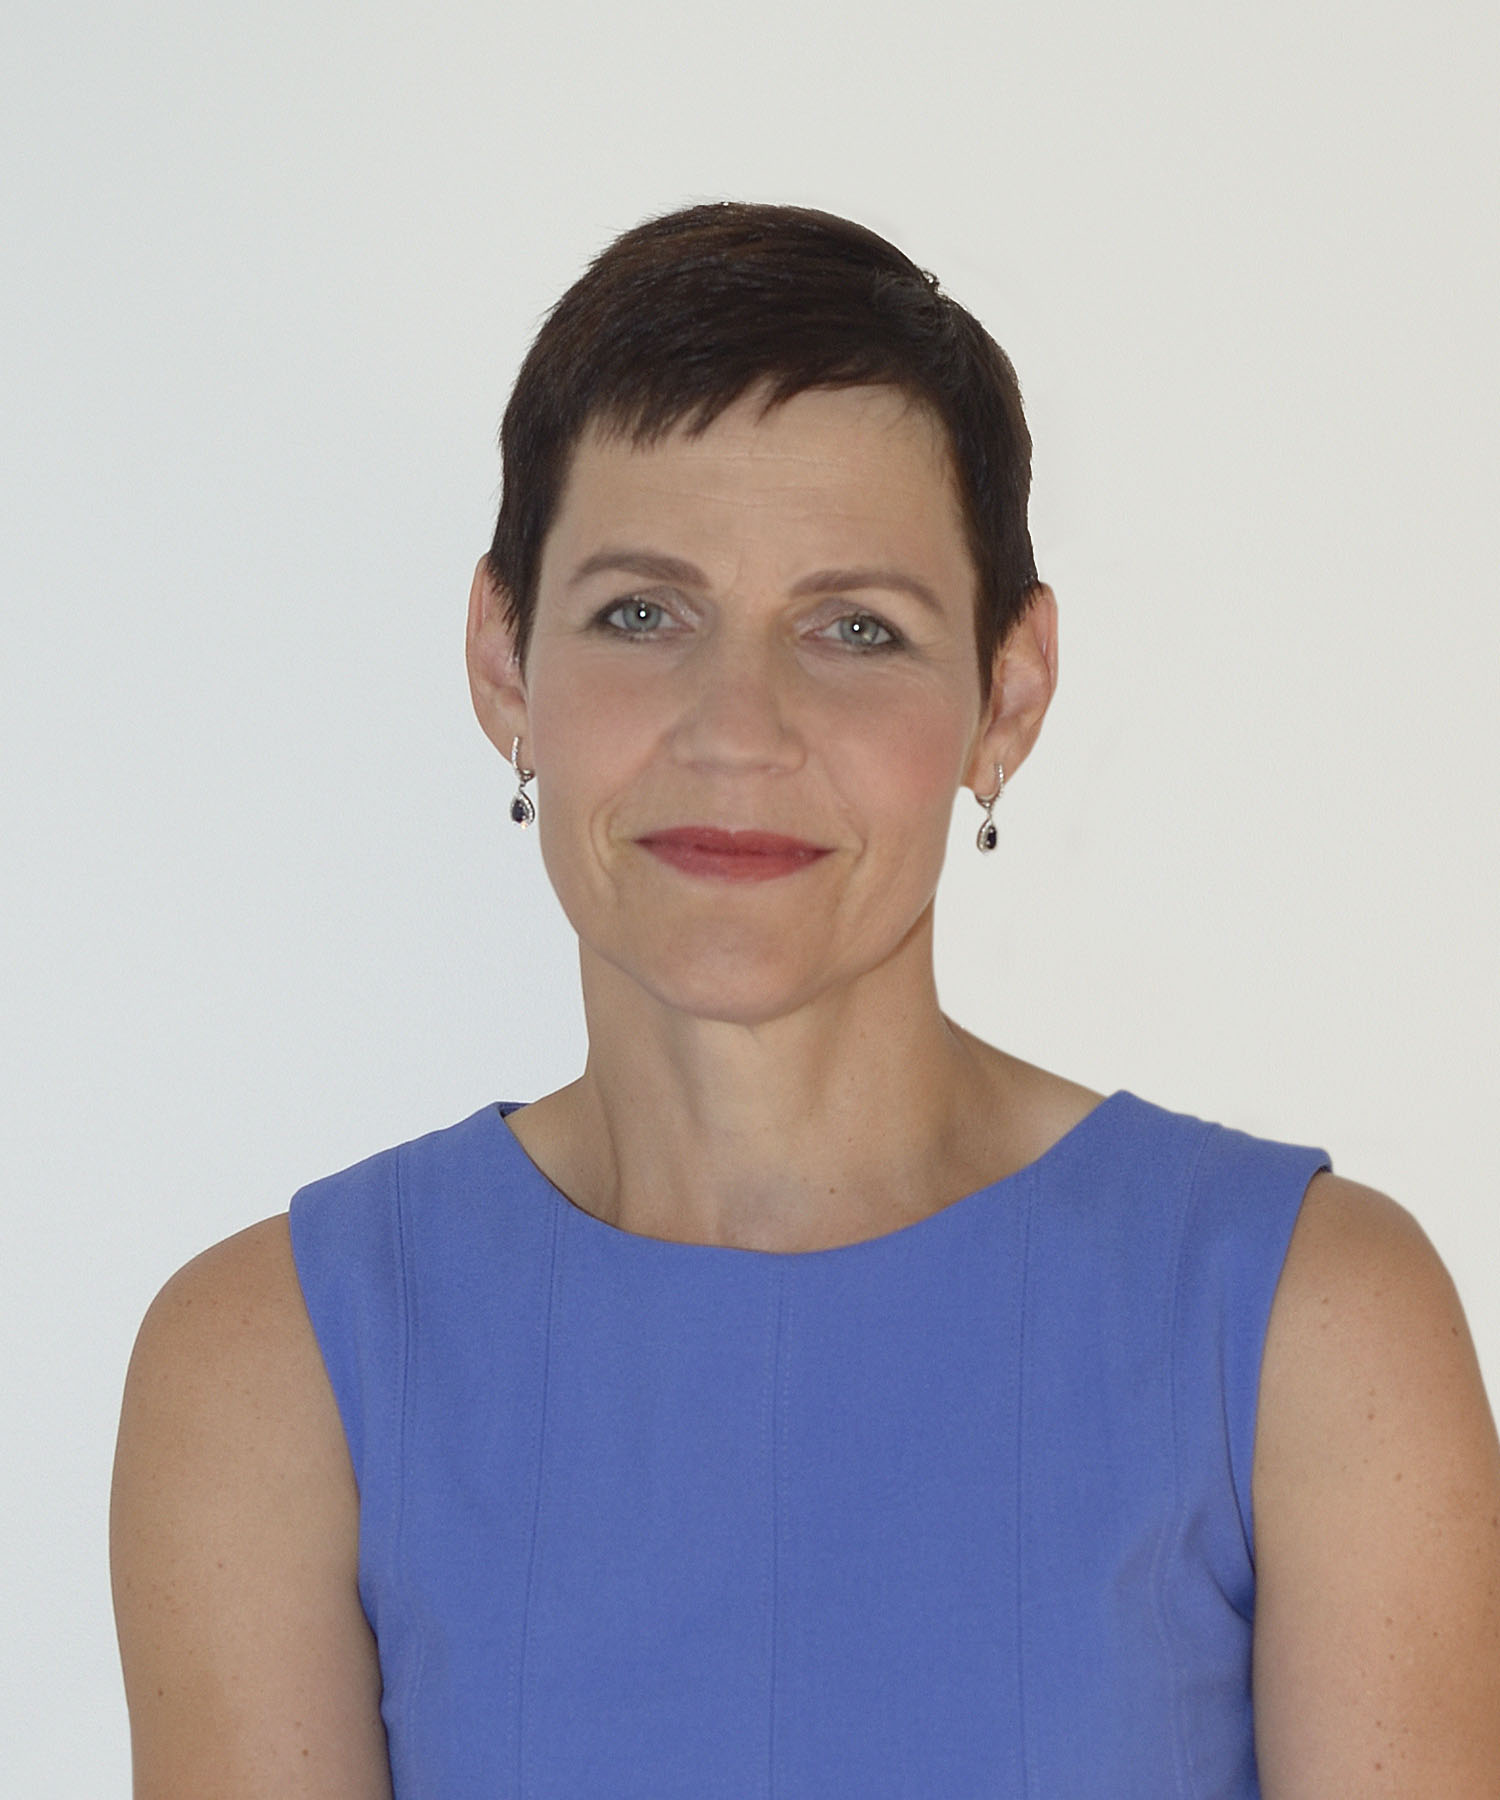 Elen Kihl